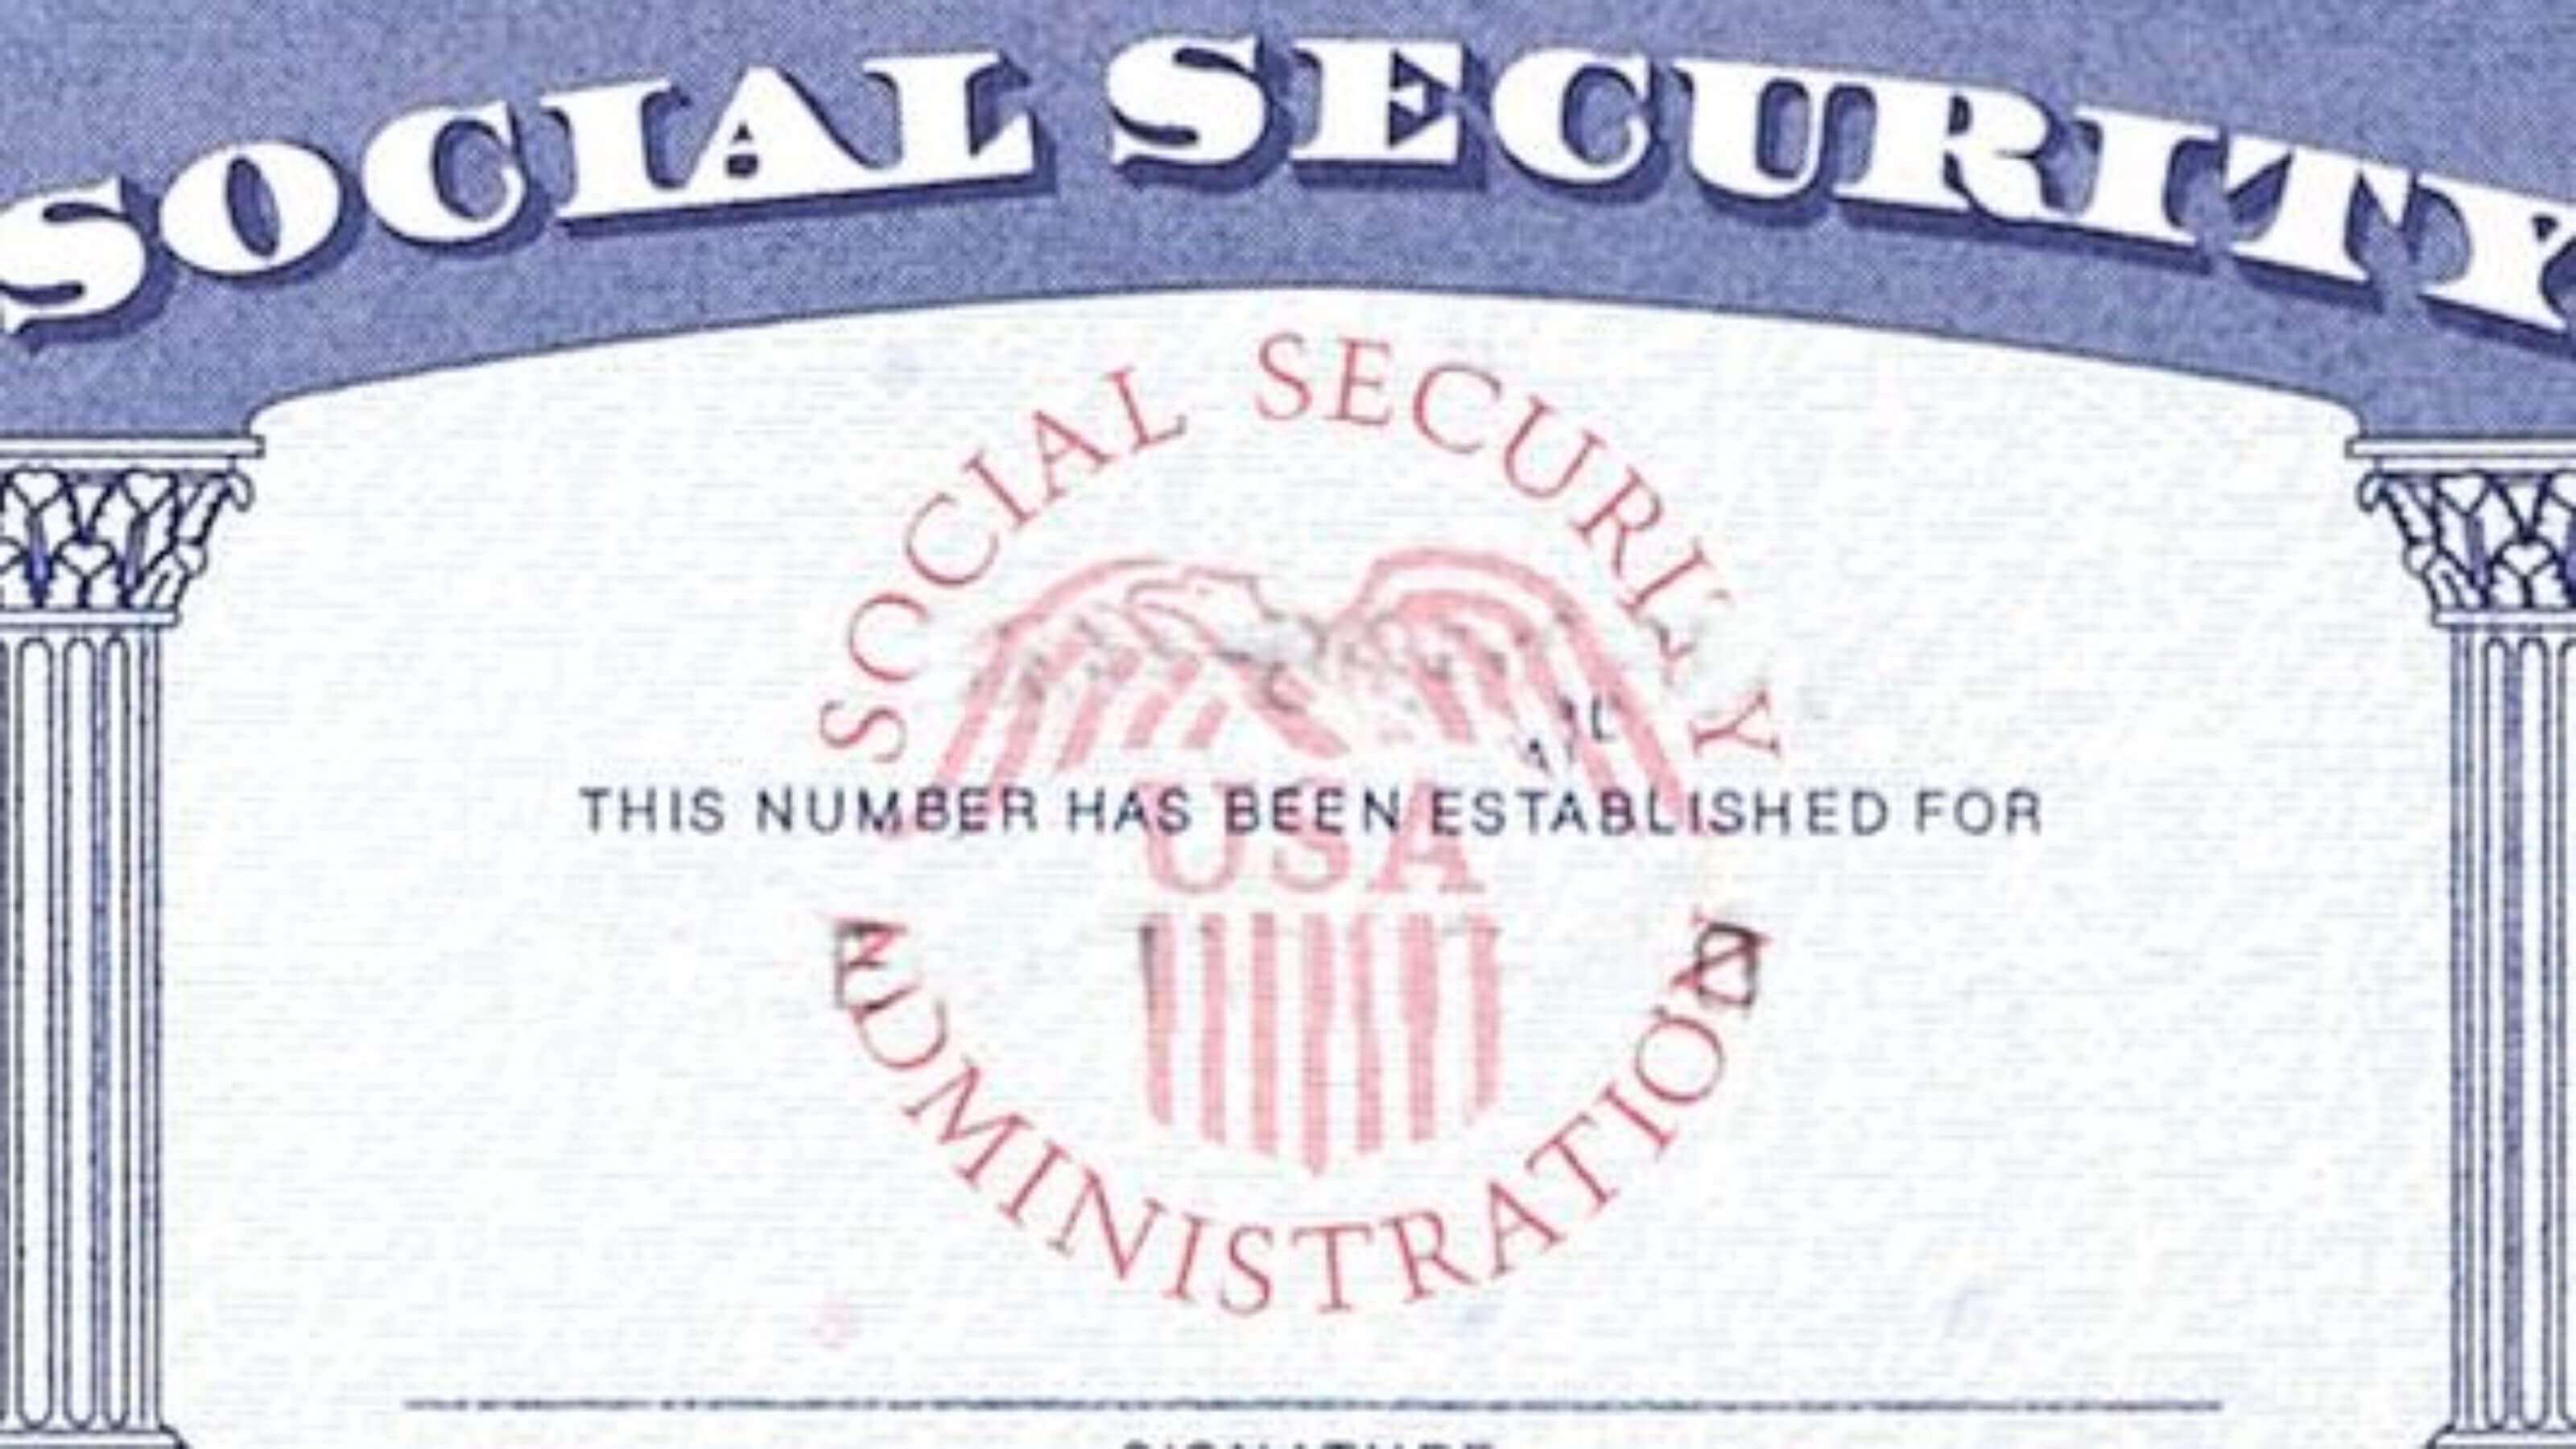 Social Security Card Template Psd - Atlantaauctionco inside Editable Social Security Card Template